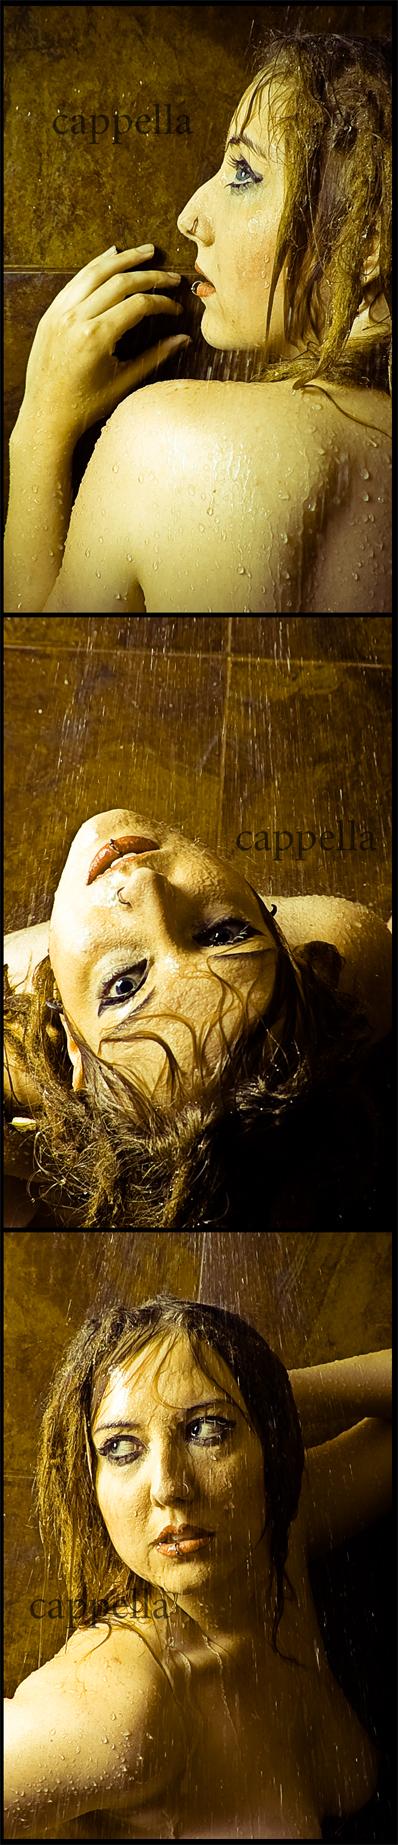 Female model photo shoot of SeaJae by JLCappella